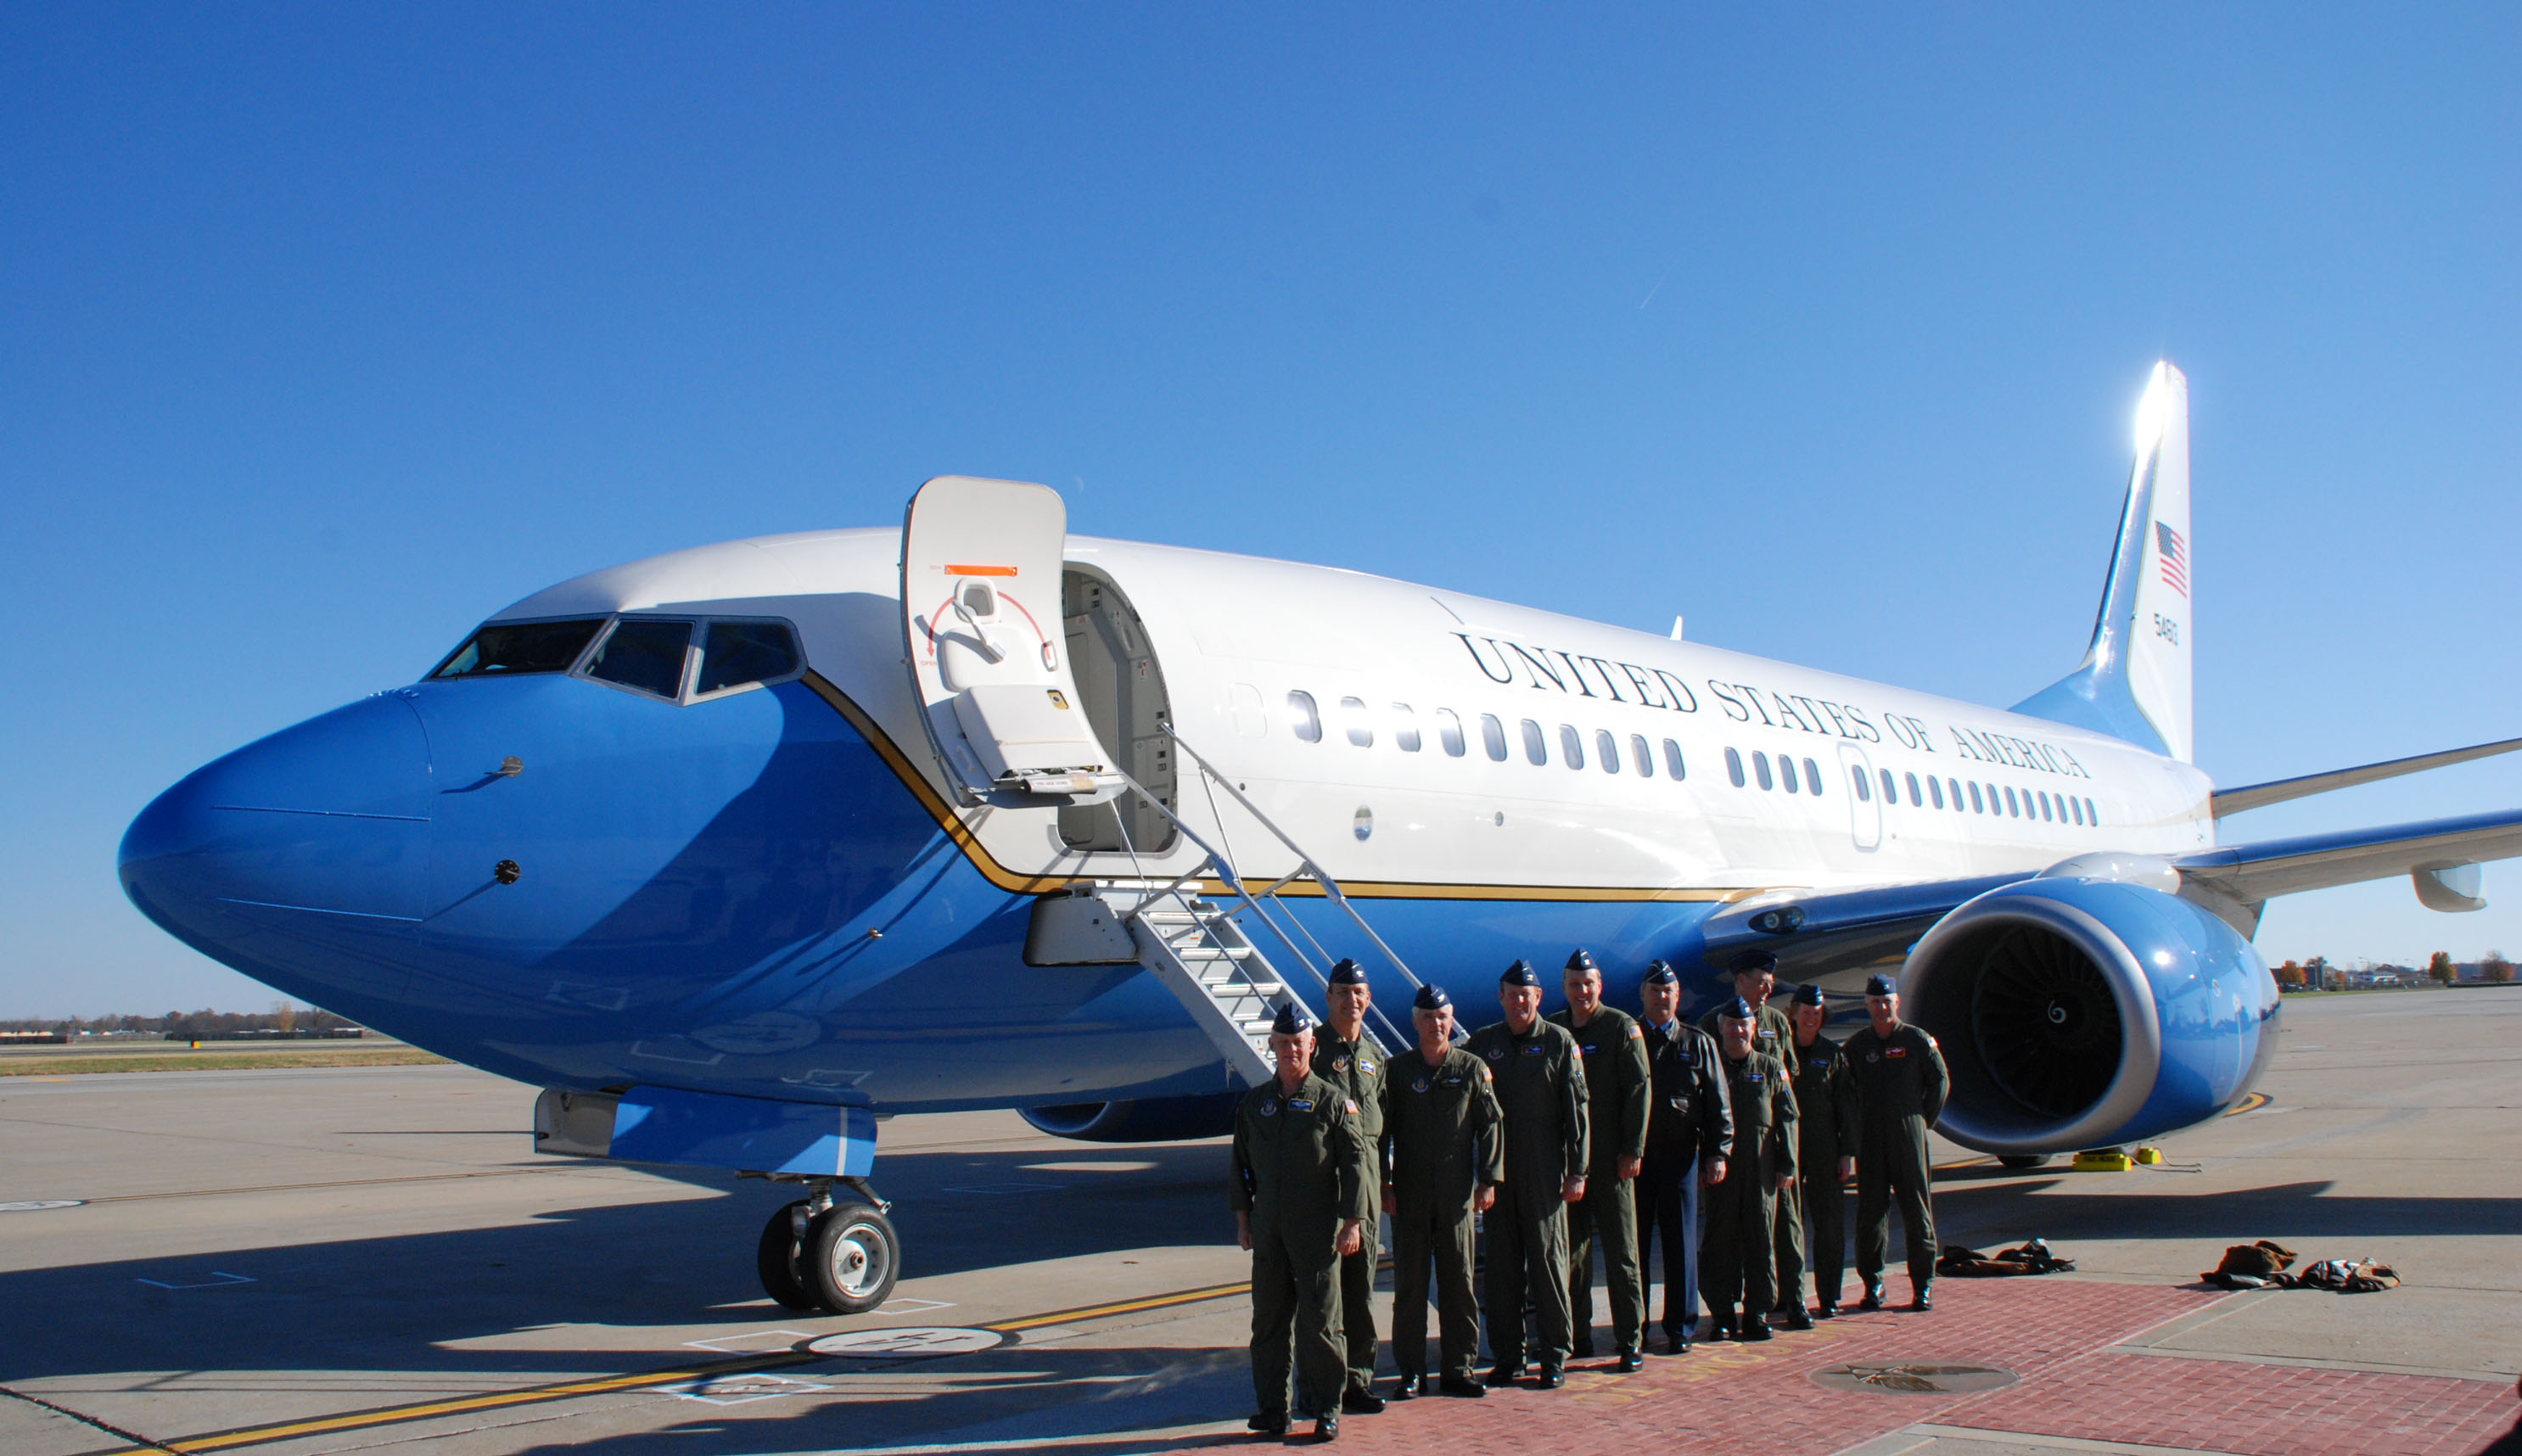 C-40B/C > U.S. Air Force > Fact Sheet Display